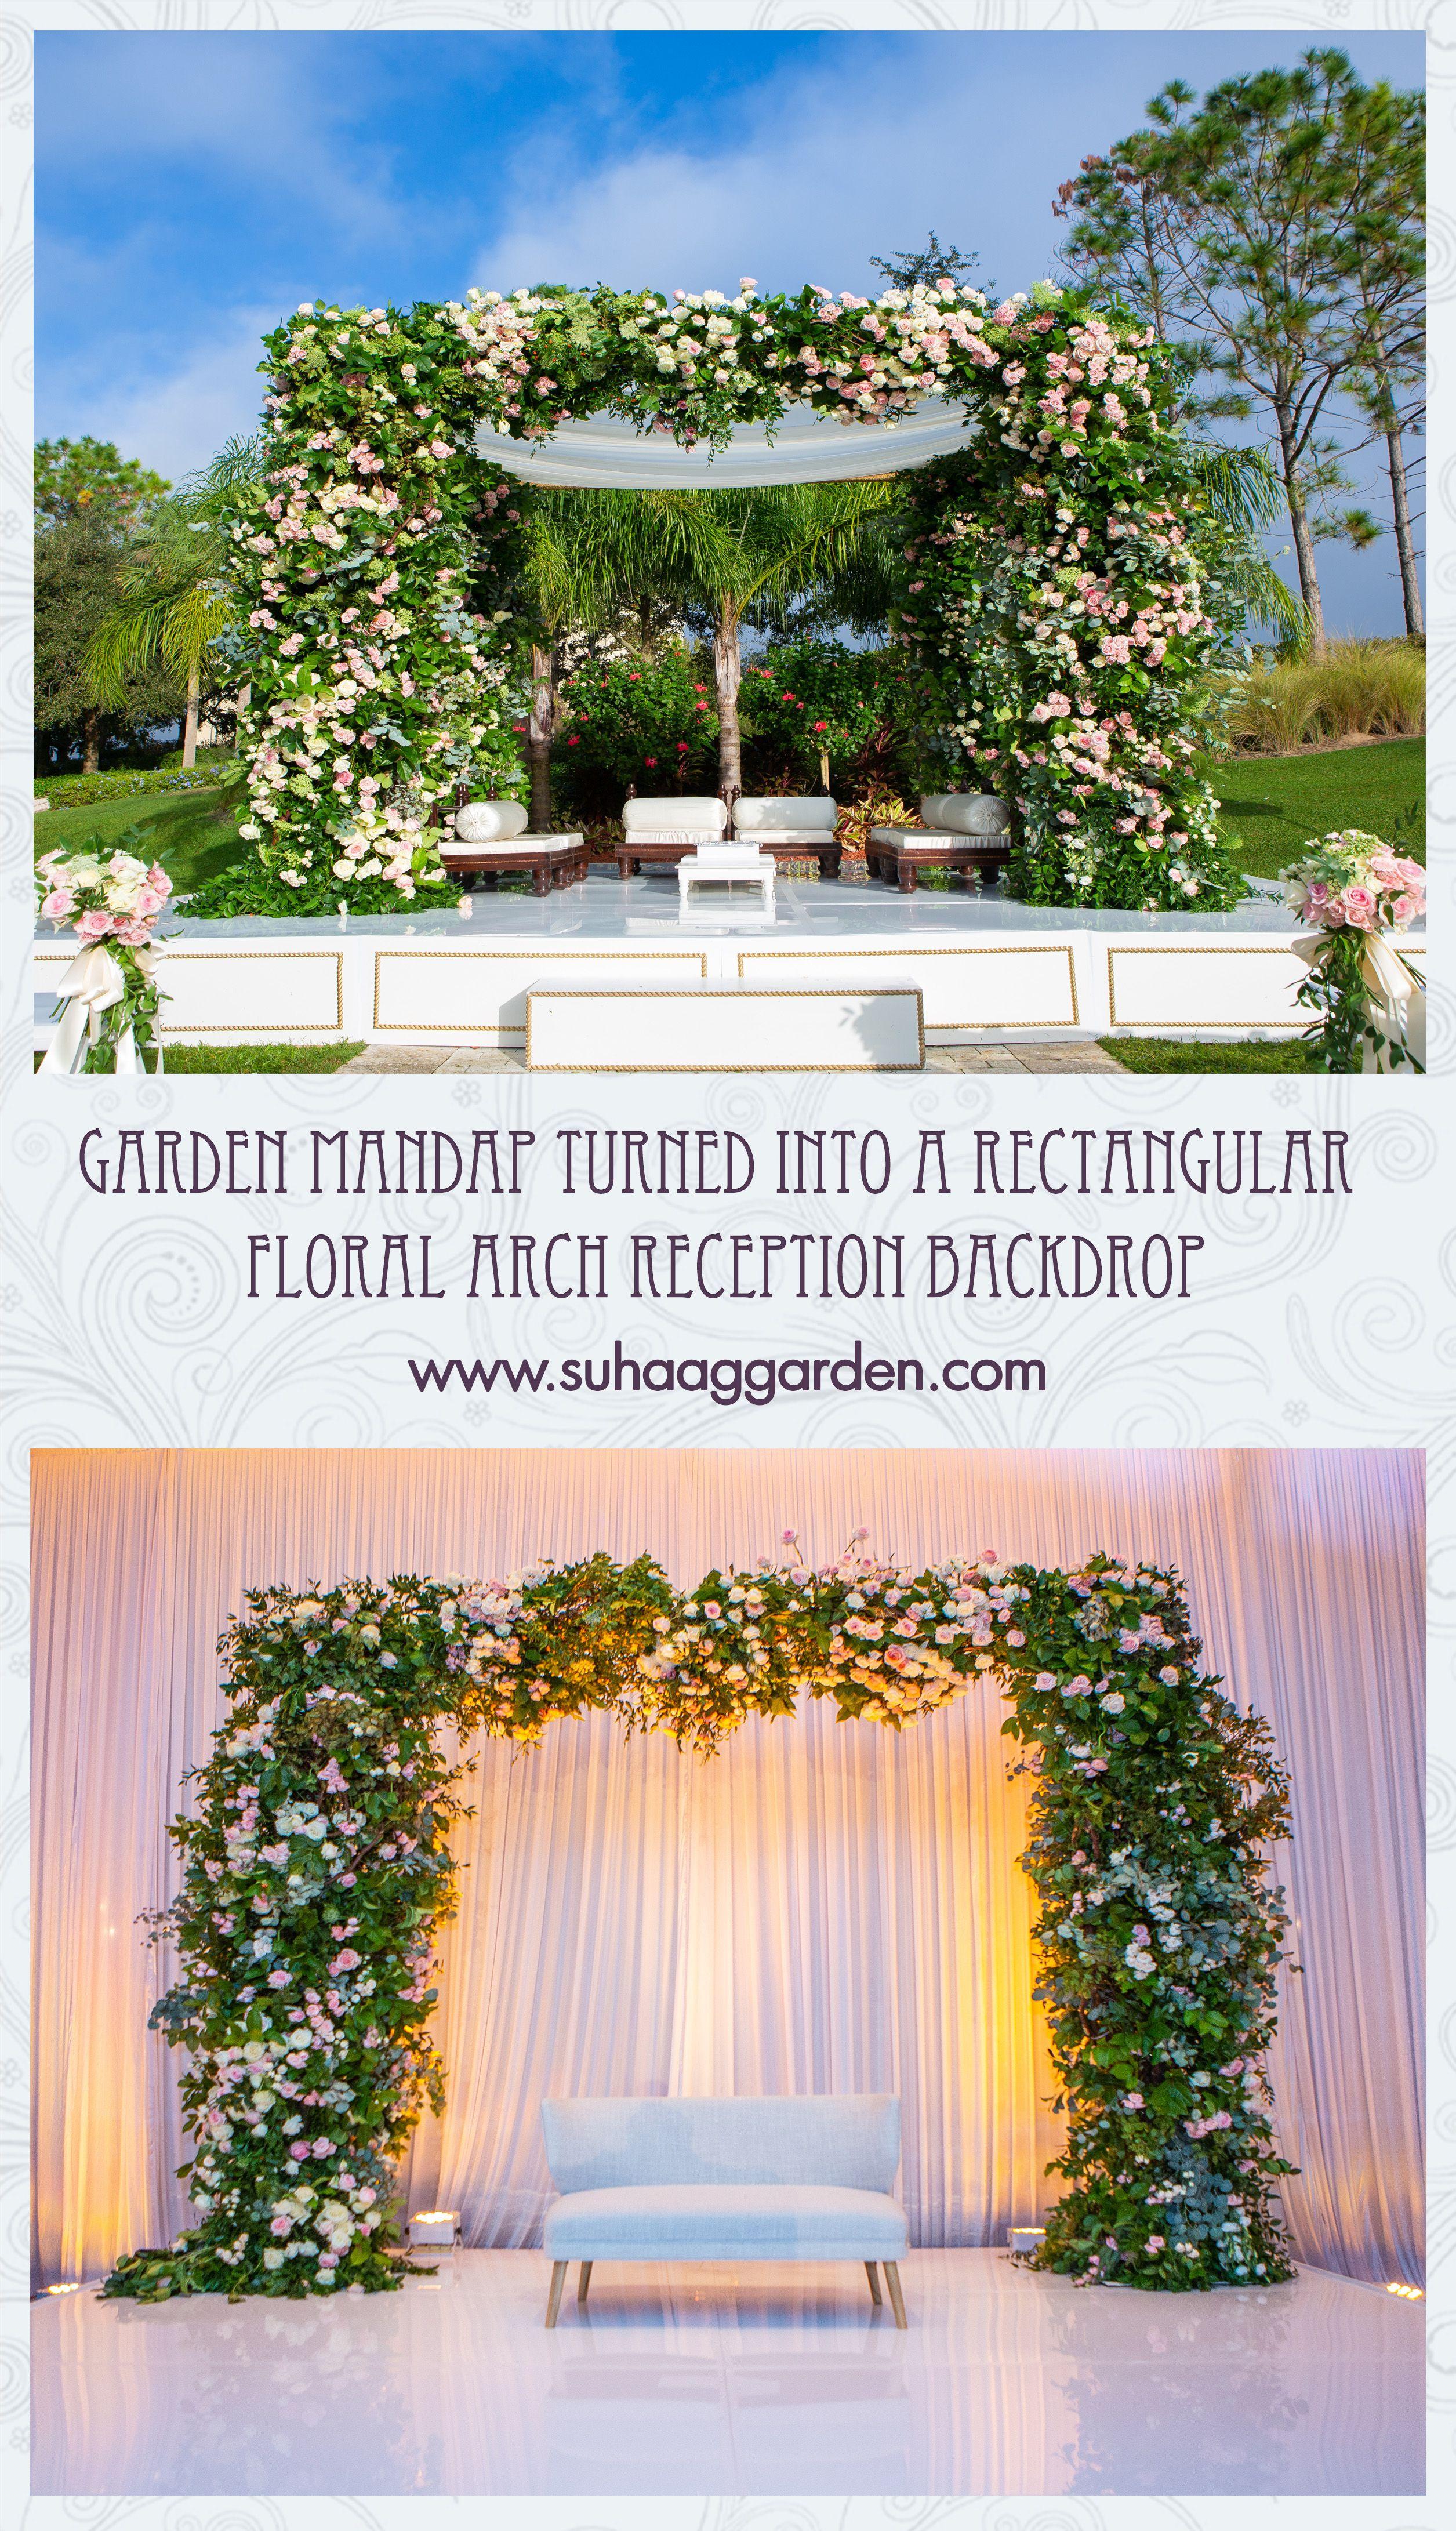 Garden Mandap Turned Into A Rectangular Floral Arch Reception